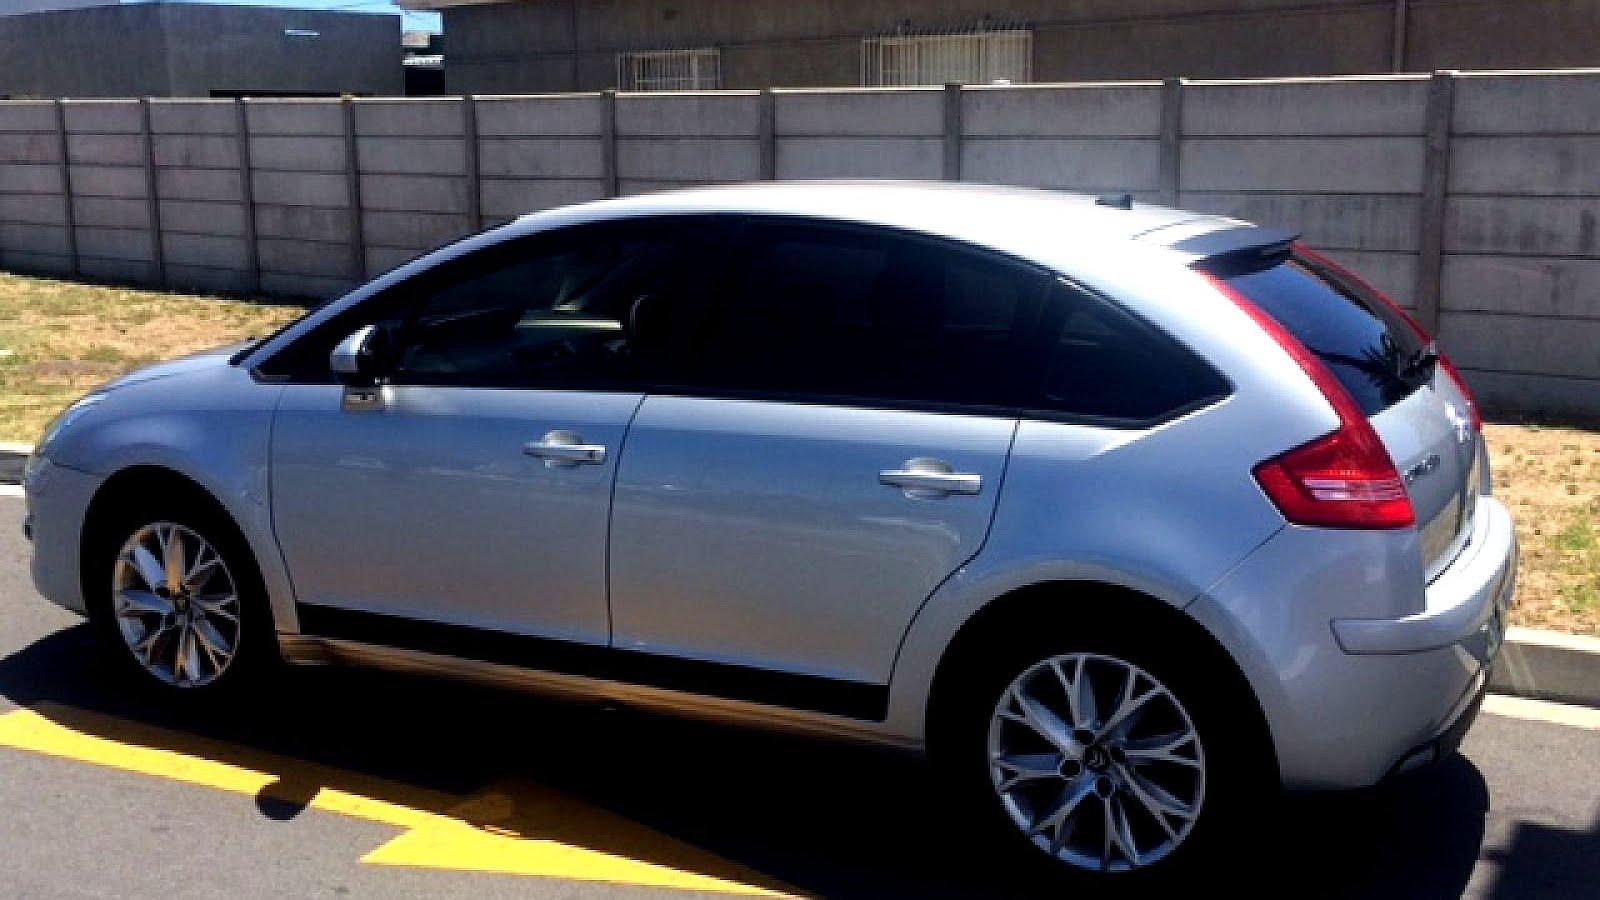 Esure Insurance Car Review